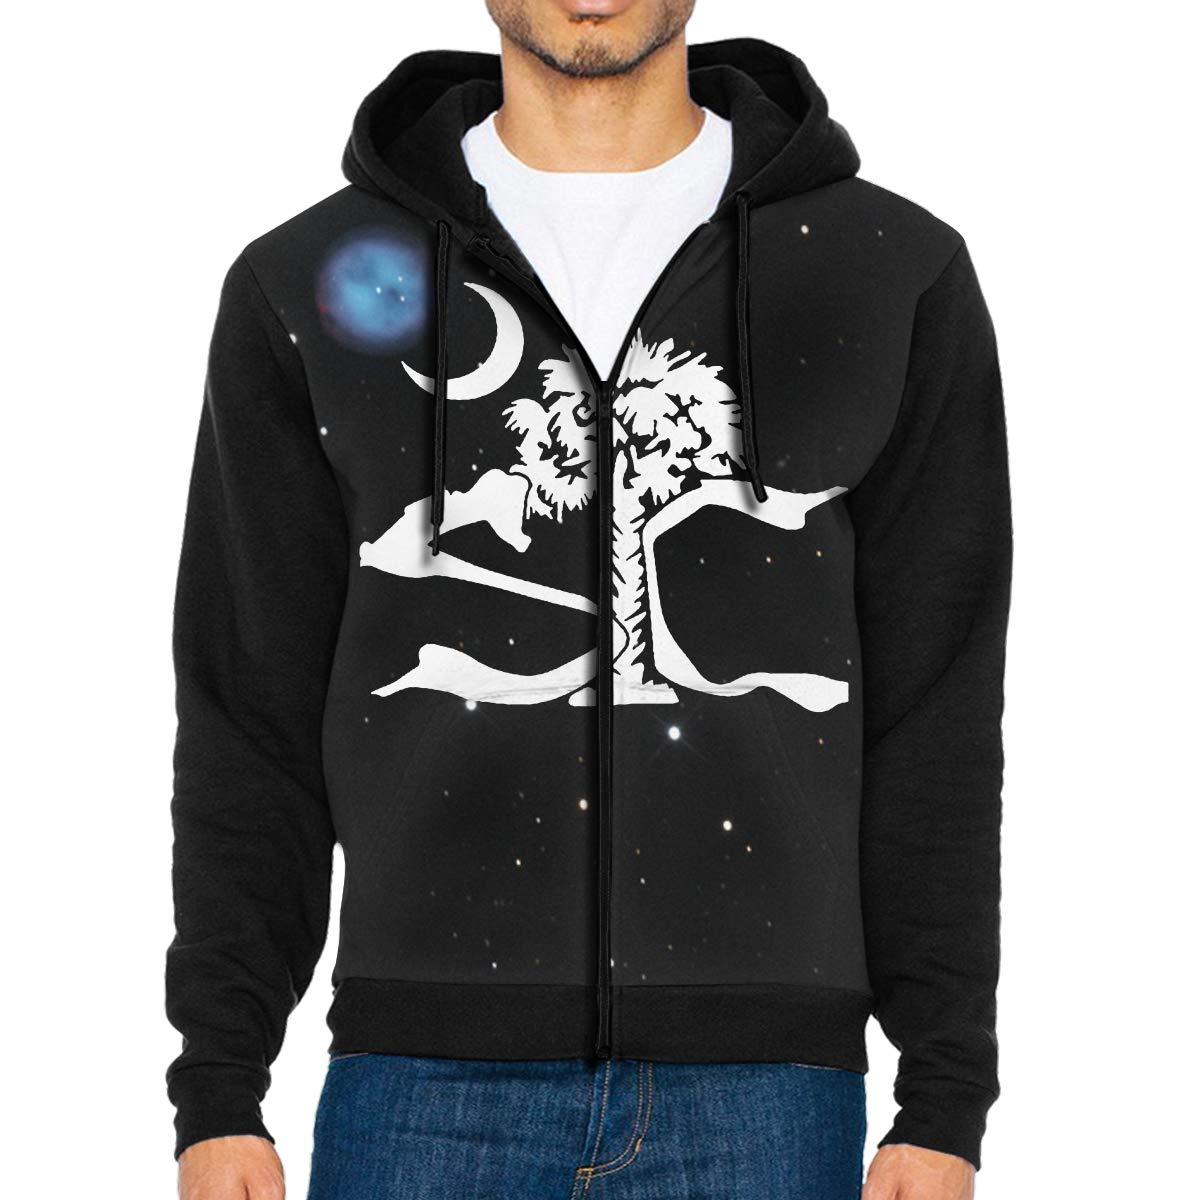 SC South Carolina Palm Mens Full-Zip Hoodie Jacket Pullover Sweatshirt